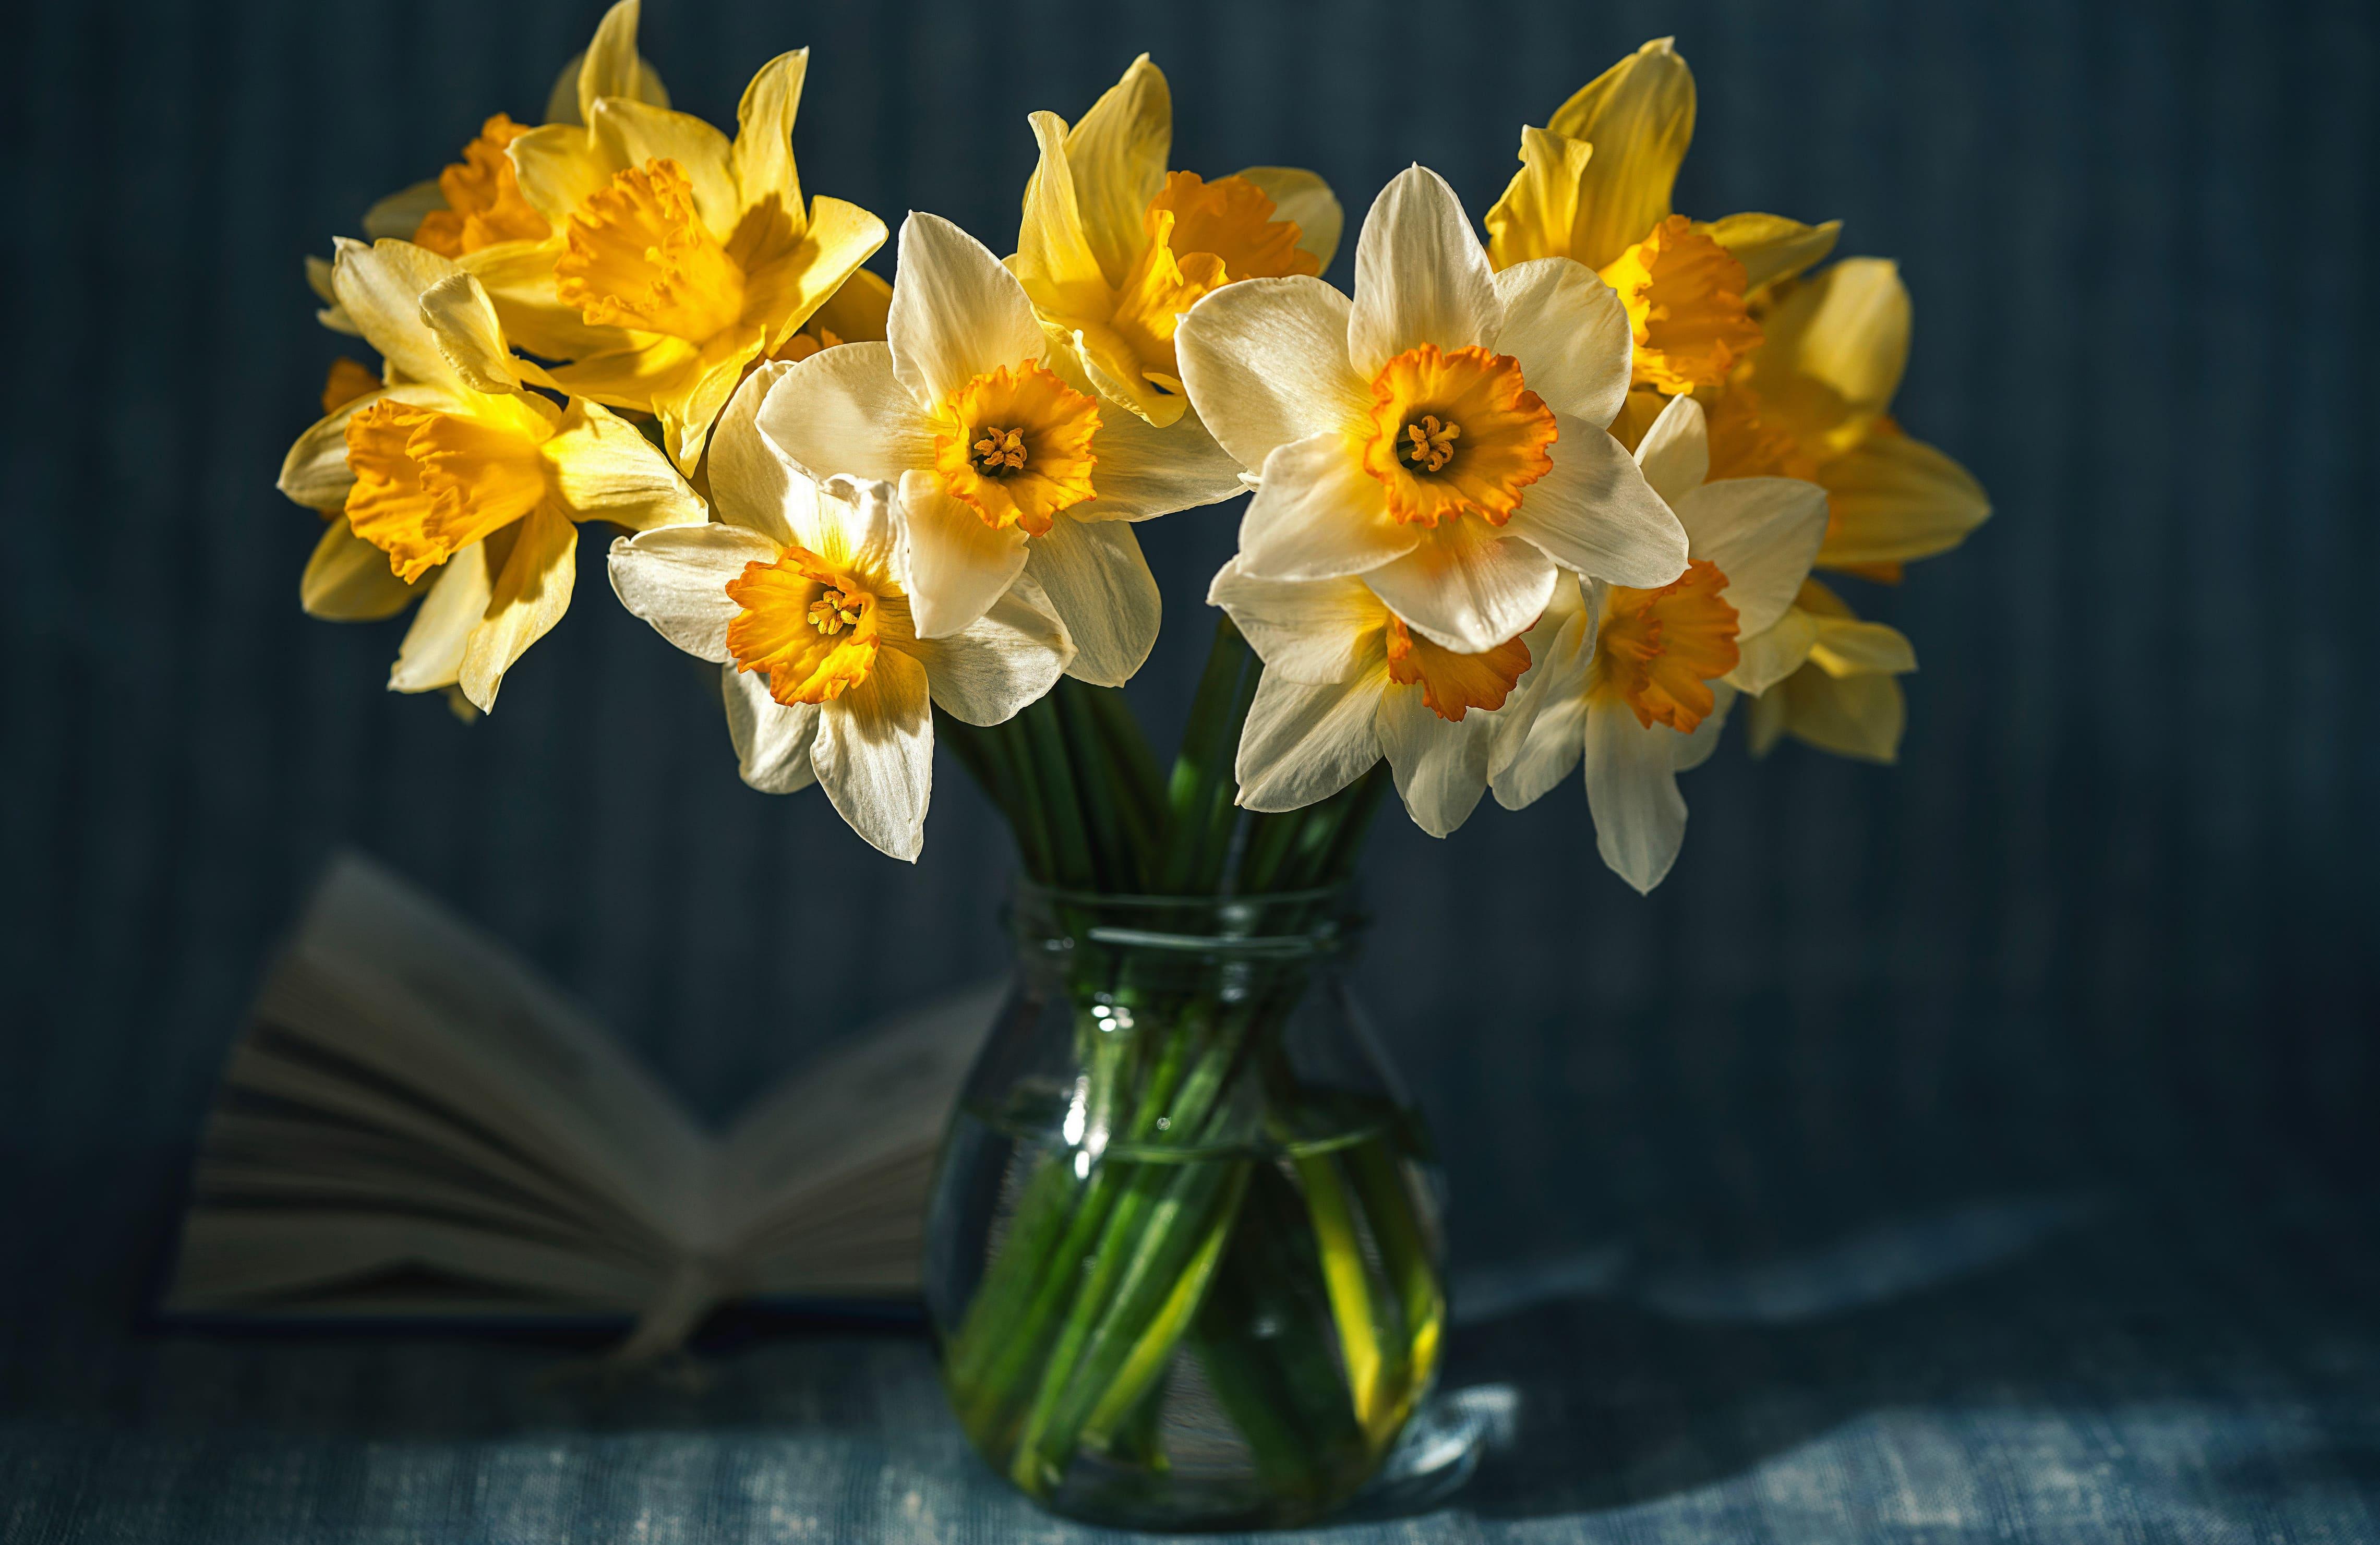 daffodils-photo-31